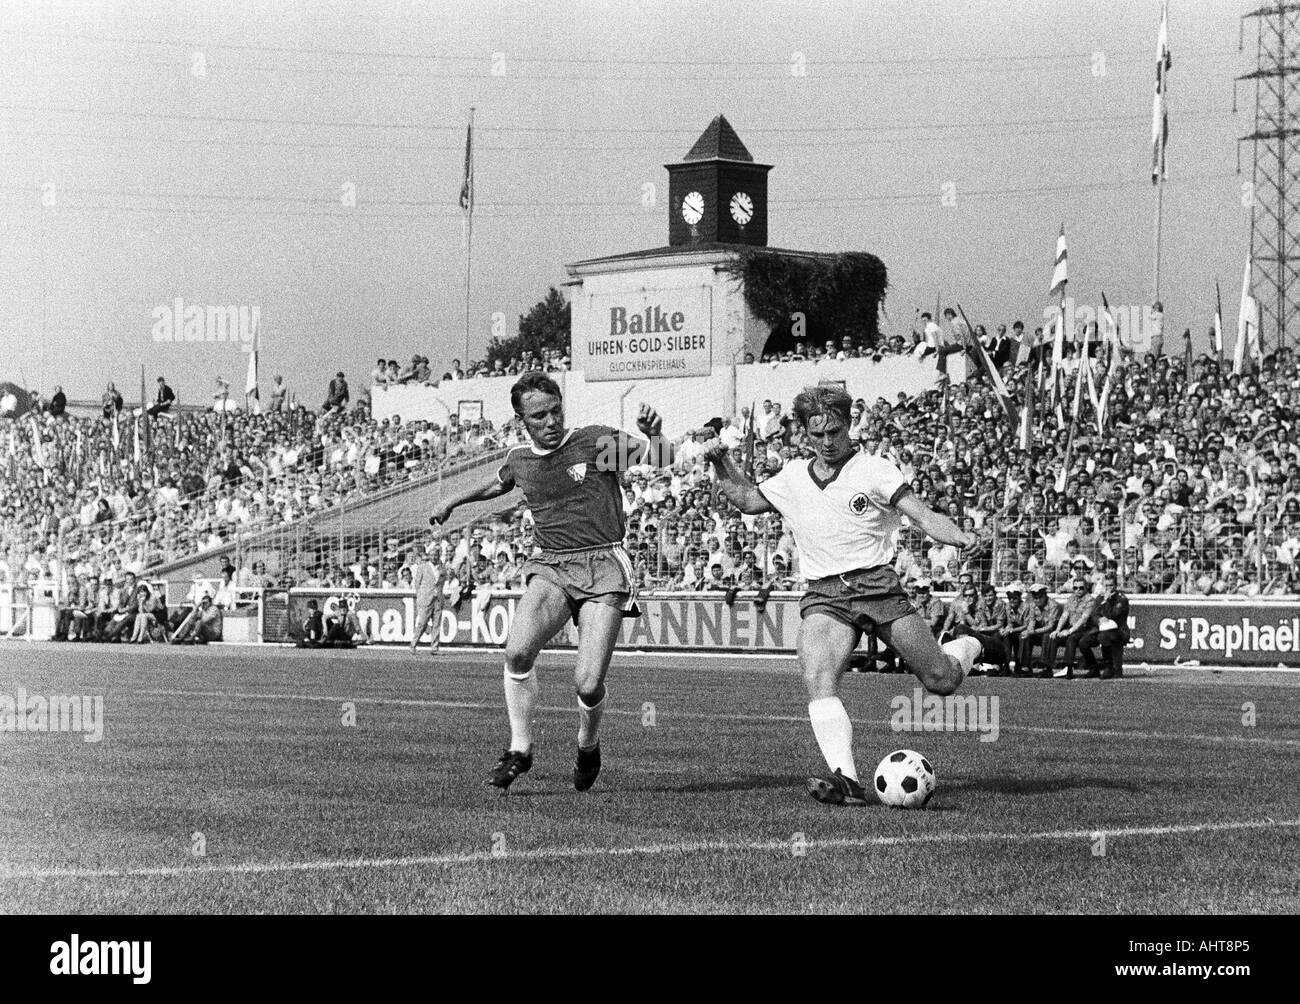 football, Bundesliga, 1971/1972, Rot-Weiss Oberhausen versus VfL Bochum 2:3, Niederrhein Stadium in Oberhausen, scene of the match, duel between Werner Kraemer (Bochum) left and Hans Schumacher (RWO) - Stock Image